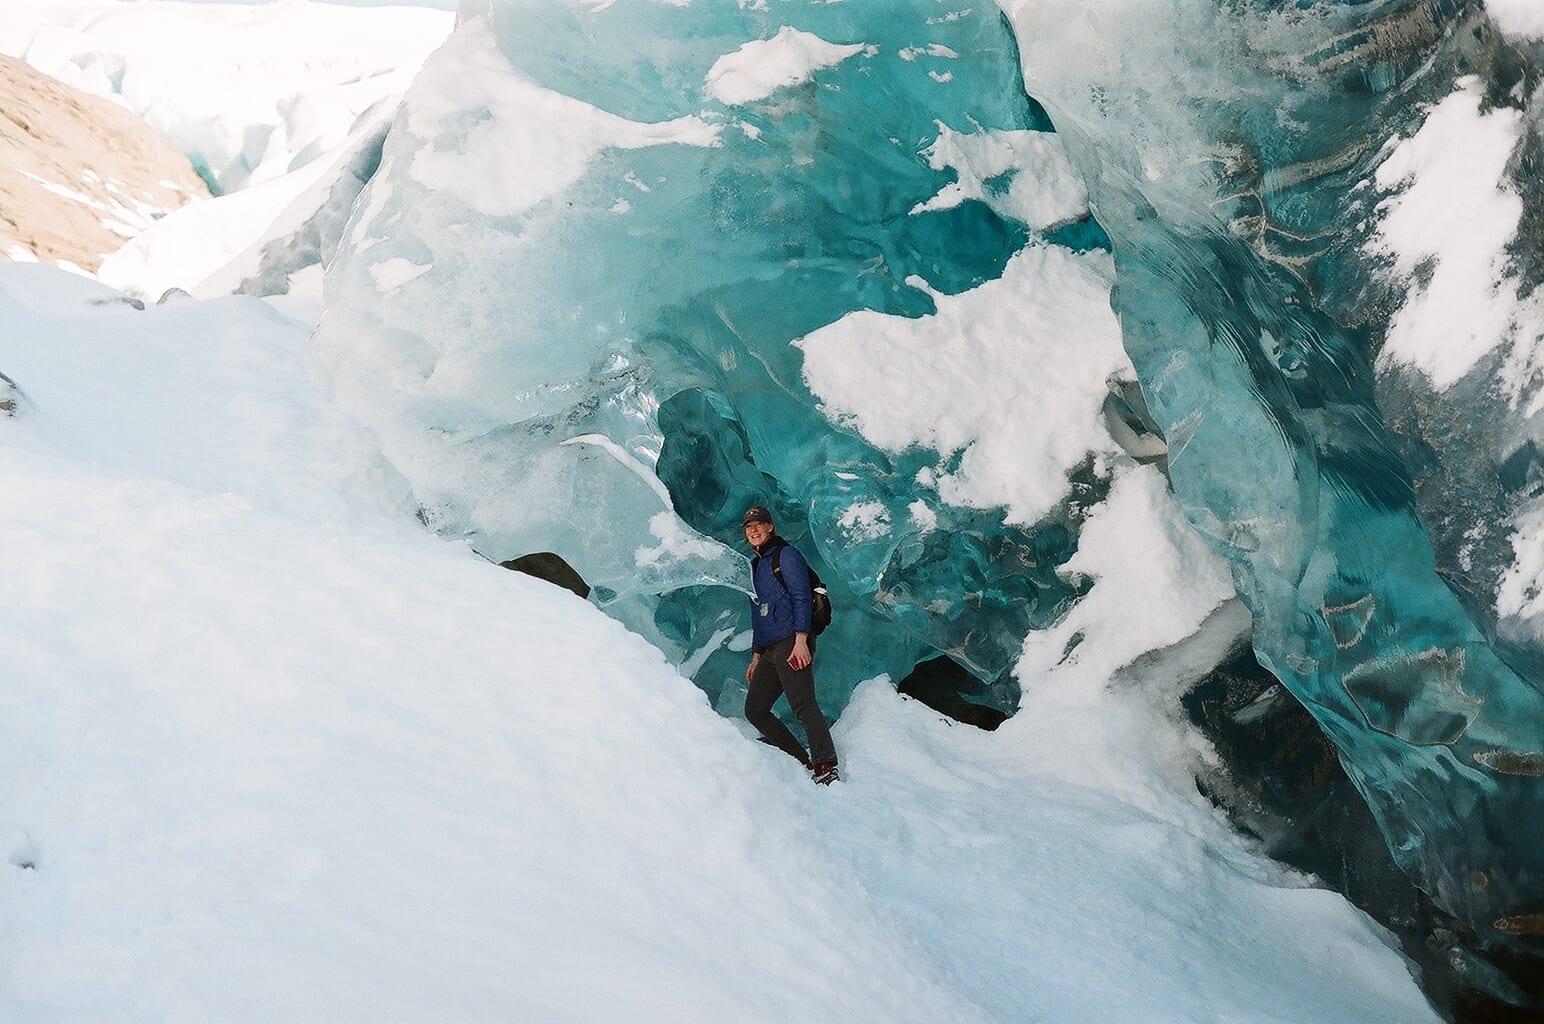 Exploring the ice caves | © Jenna Kunze/Unearth Women